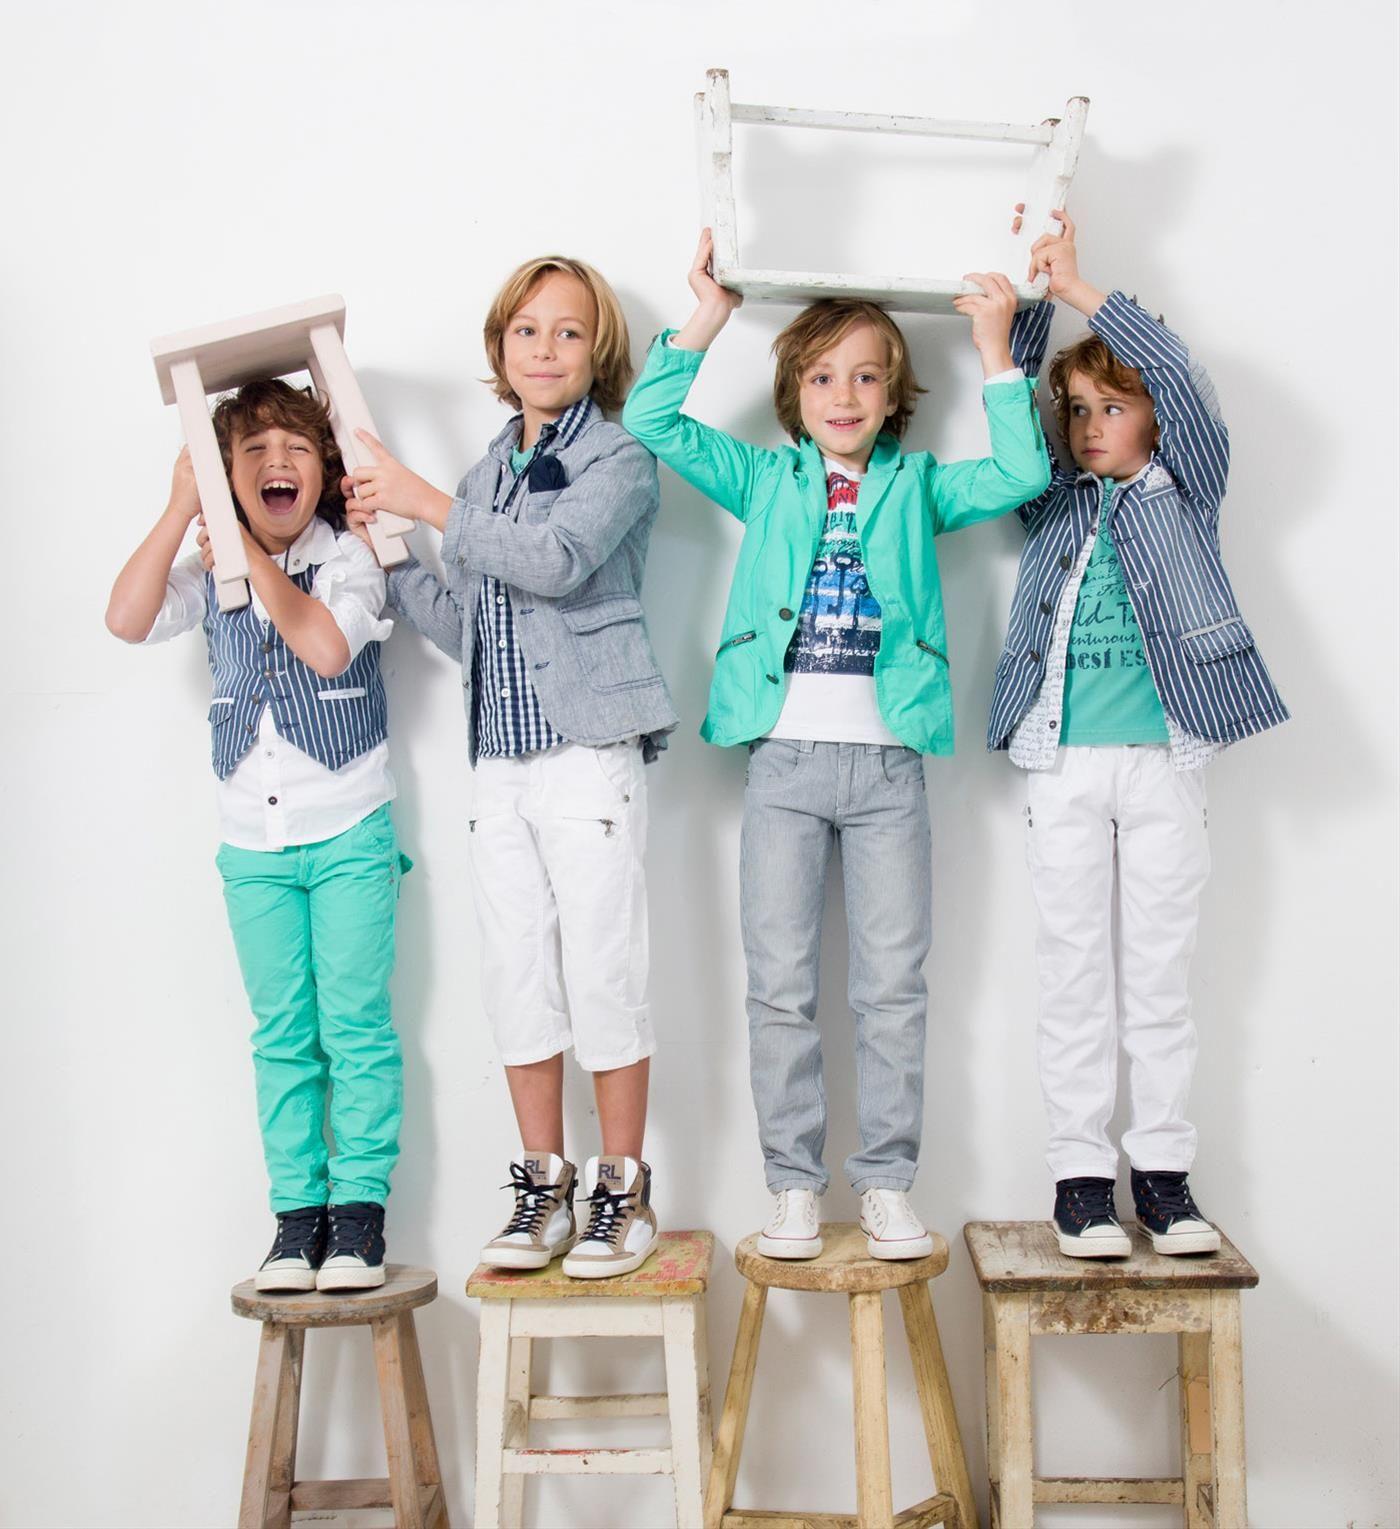 Carbone Kinderkleding.Carbone Jongenskleding Communiekleding Nummerzestien Eu Alex